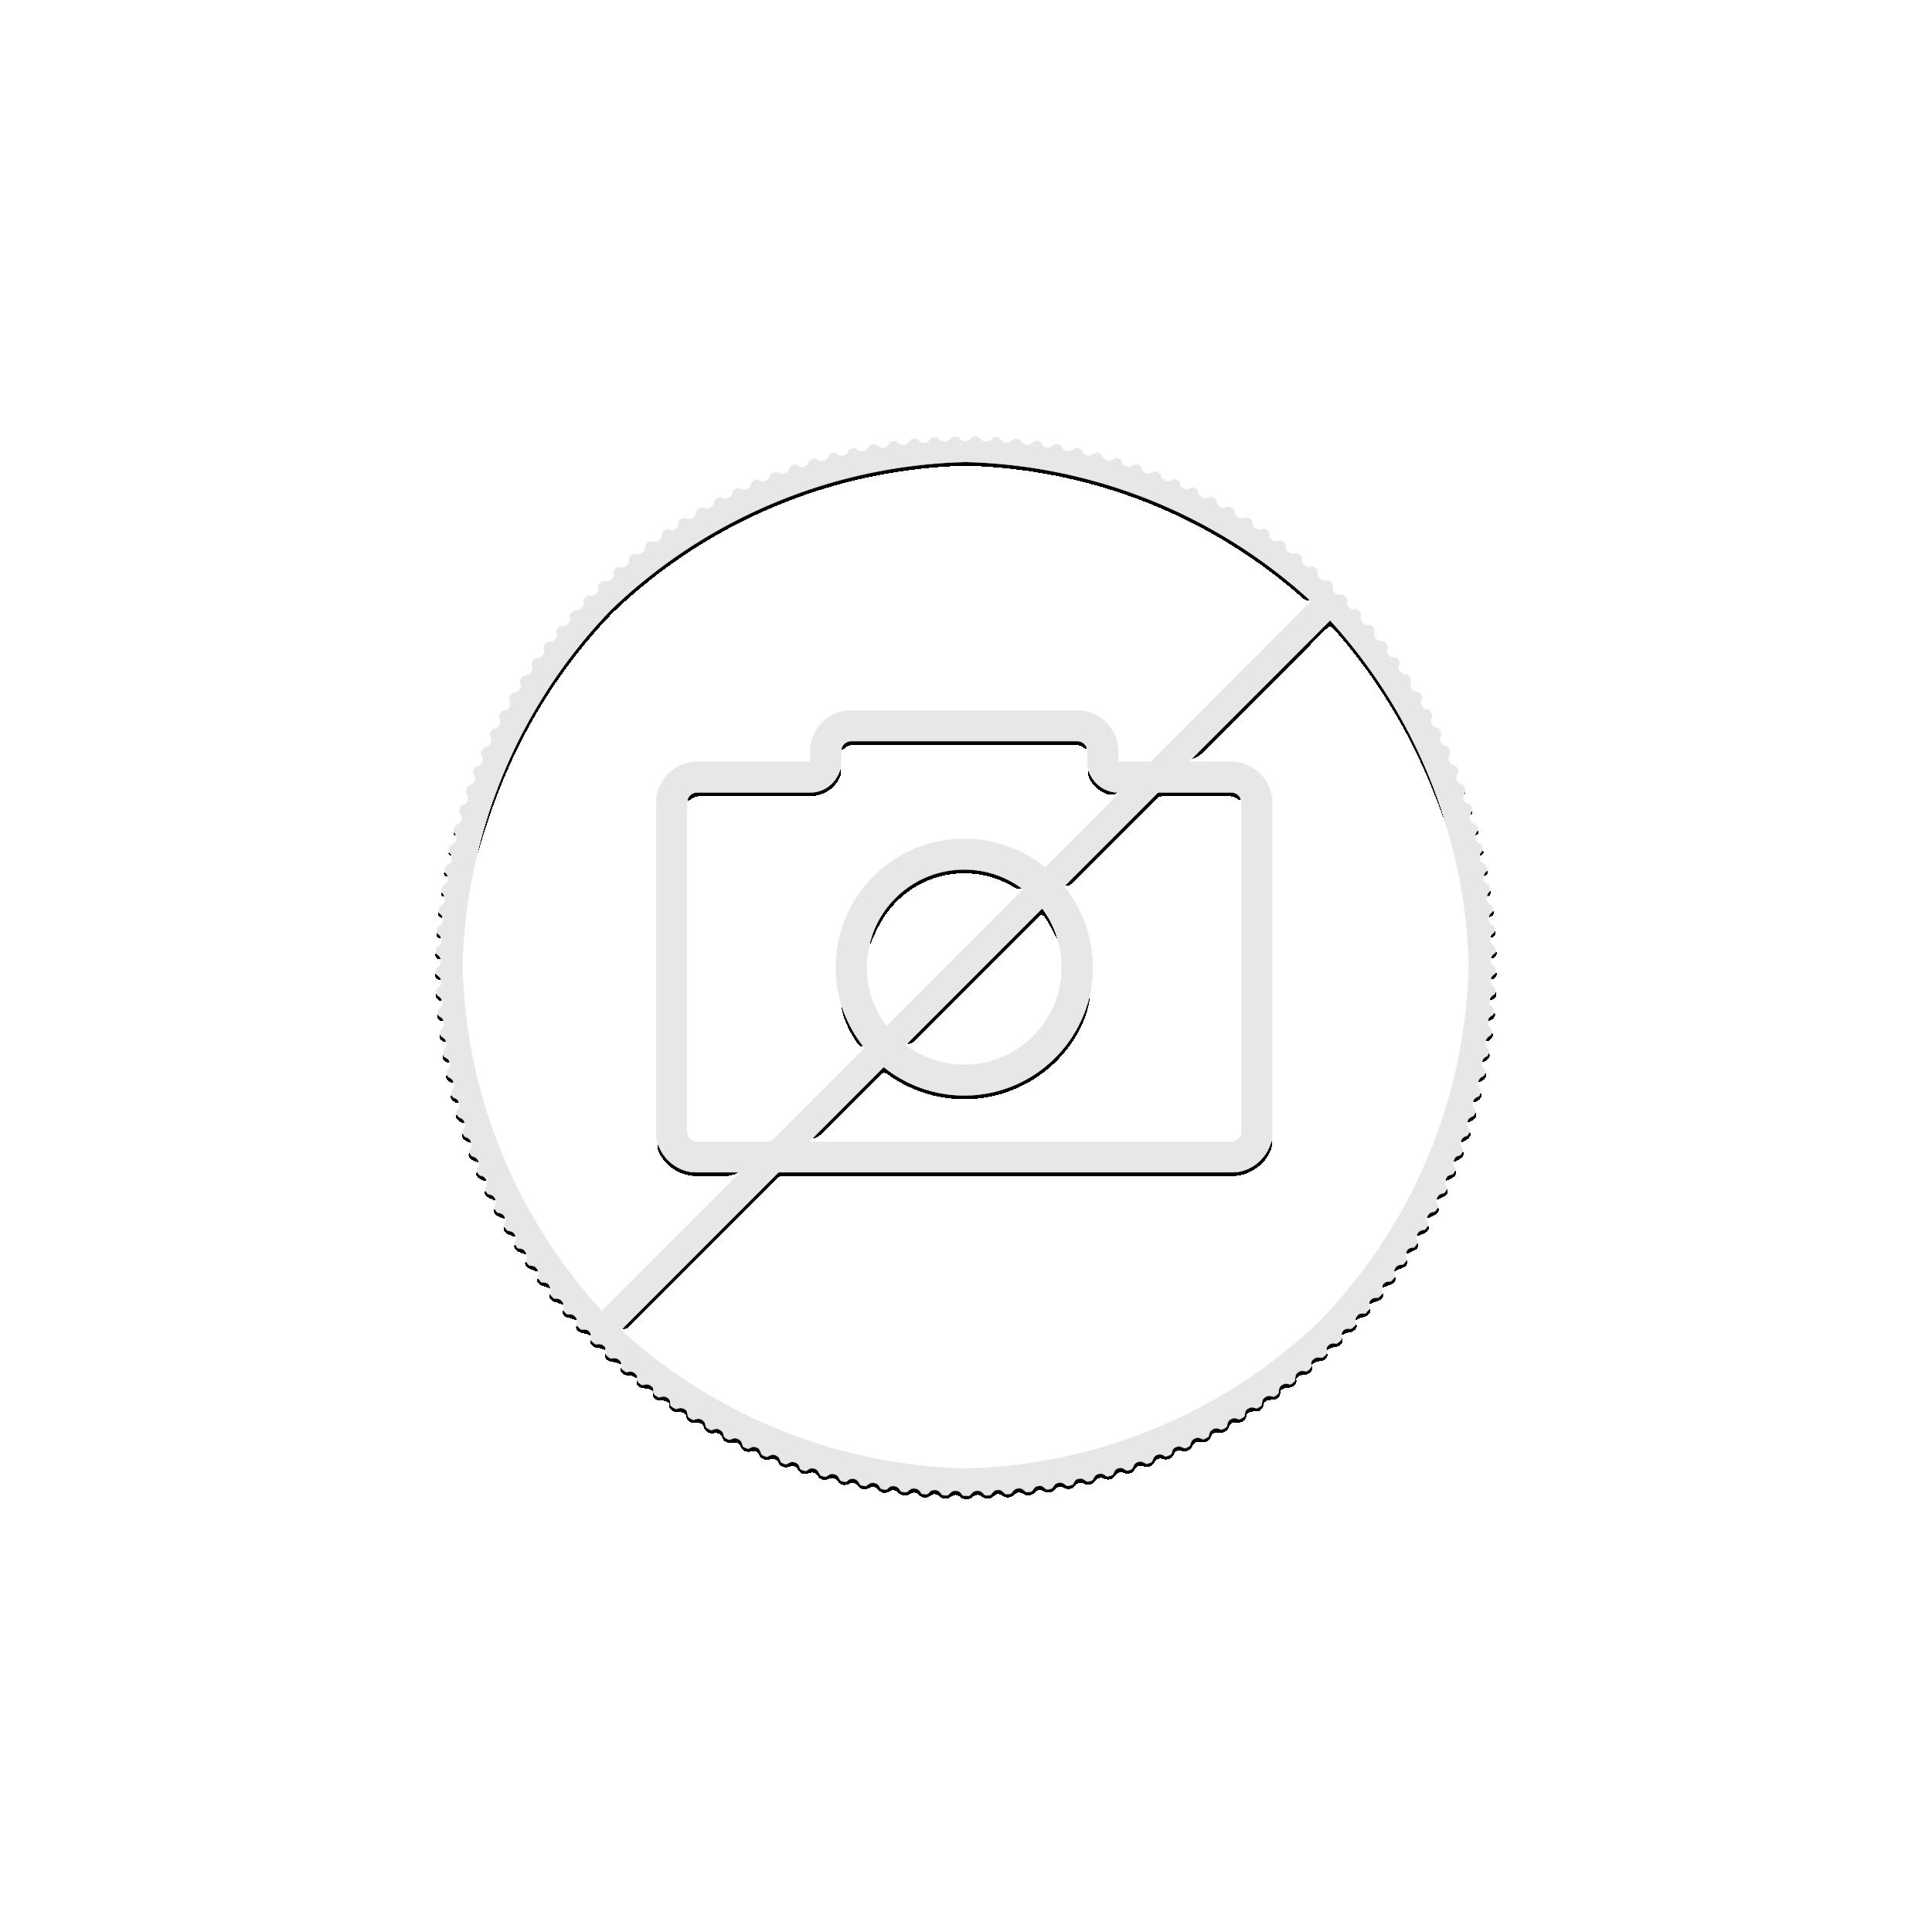 2 troy ounce zilveren munt vrouwlijke strijder - Valkyrie 2020